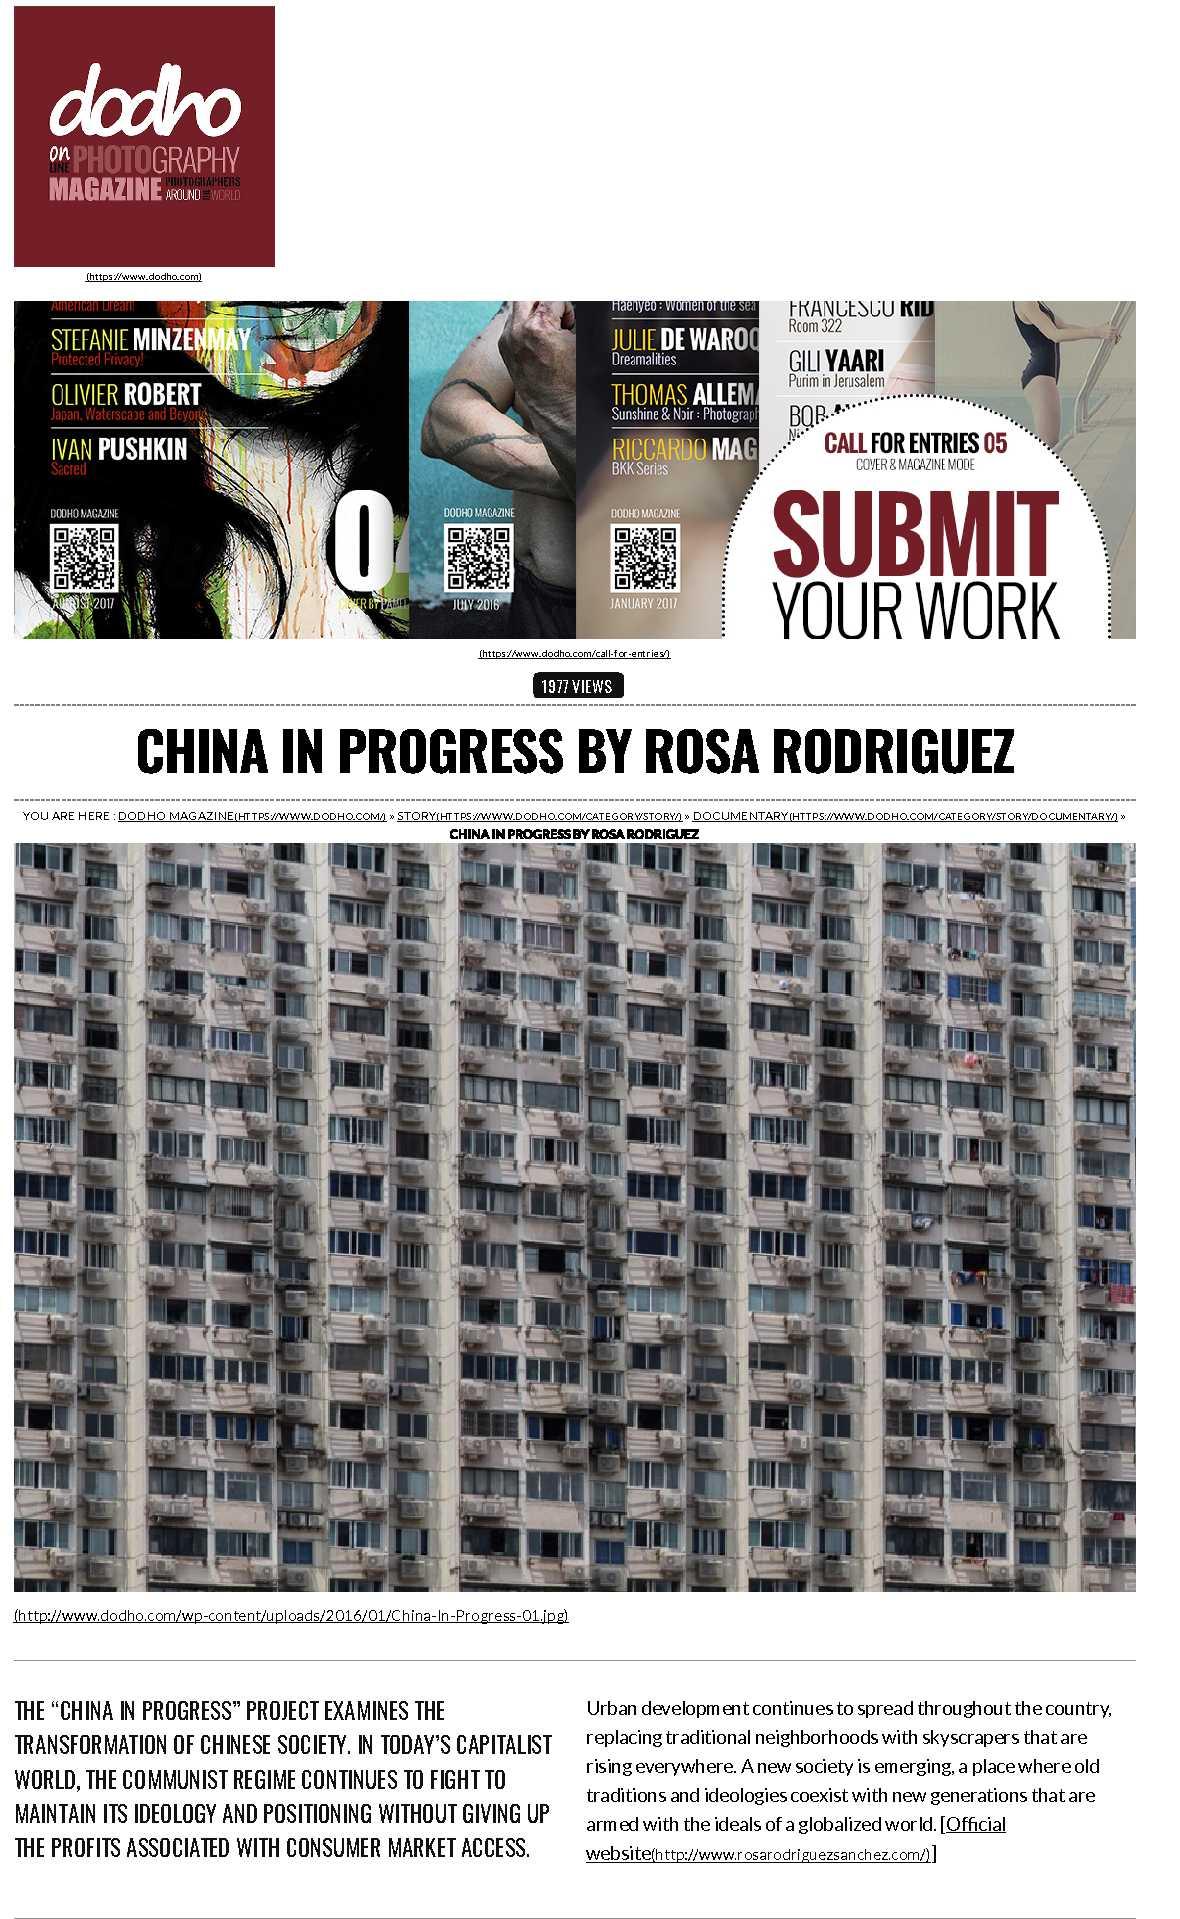 China In Progress By Rosa Rodriguez _ Dodho Magazine_1